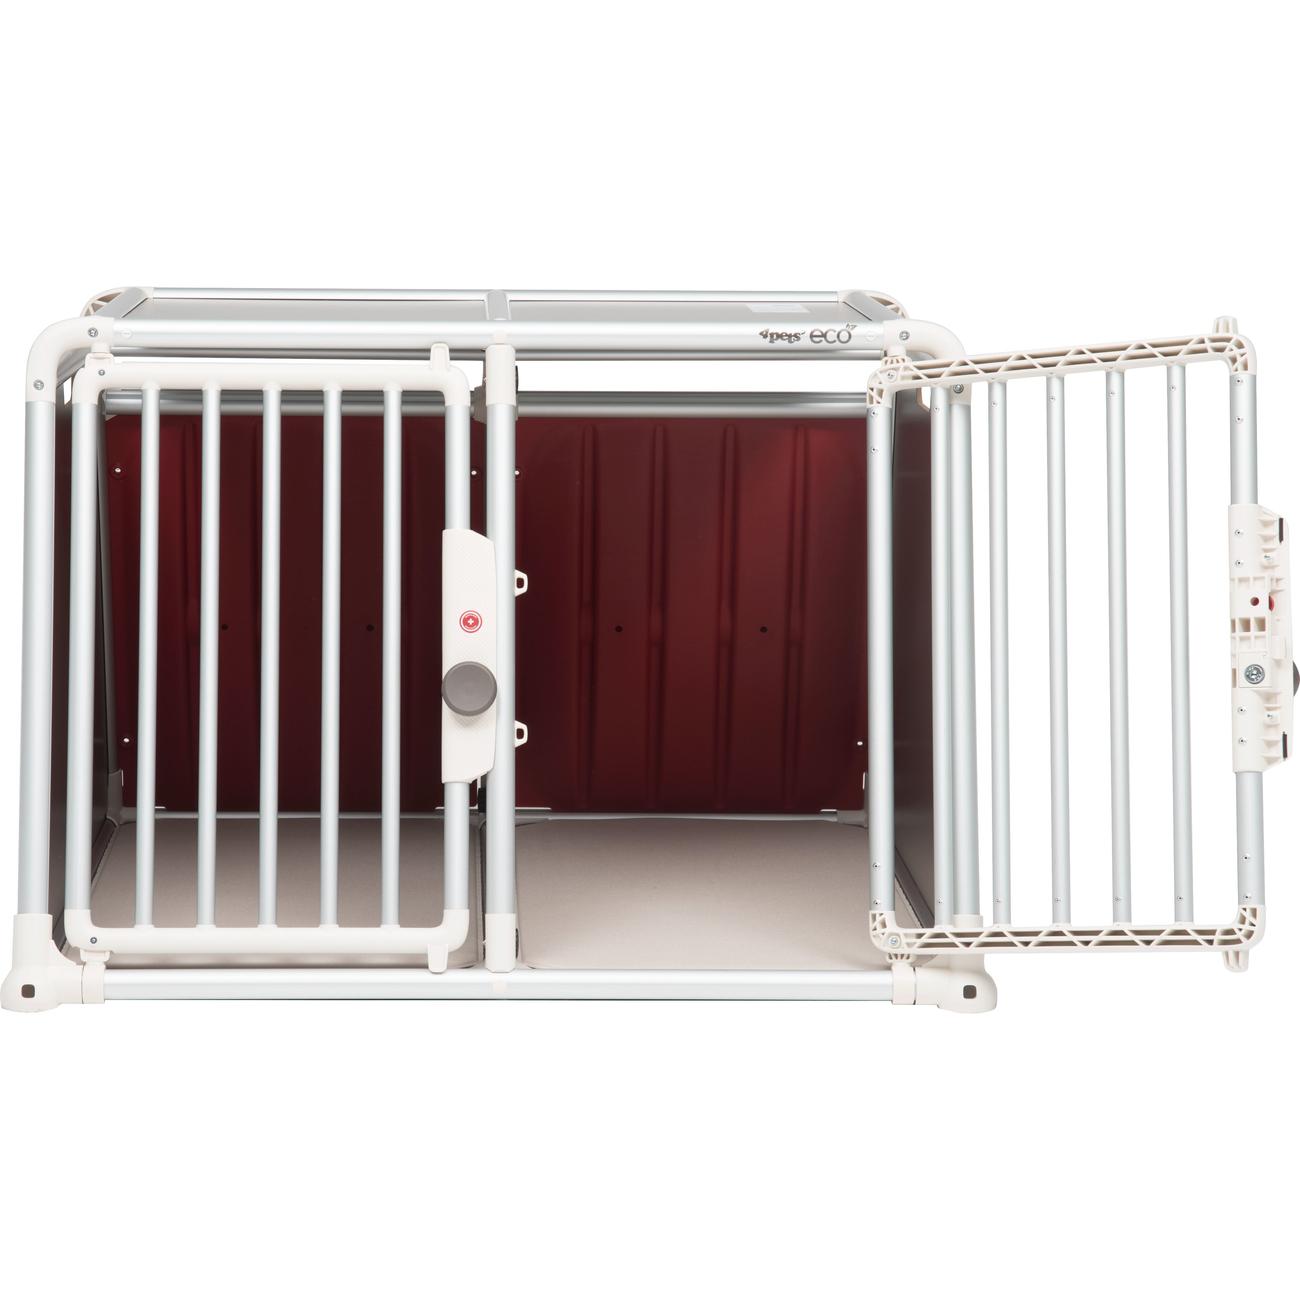 4pets Alu Autobox für 2 Hunde ECO 22, Bild 3